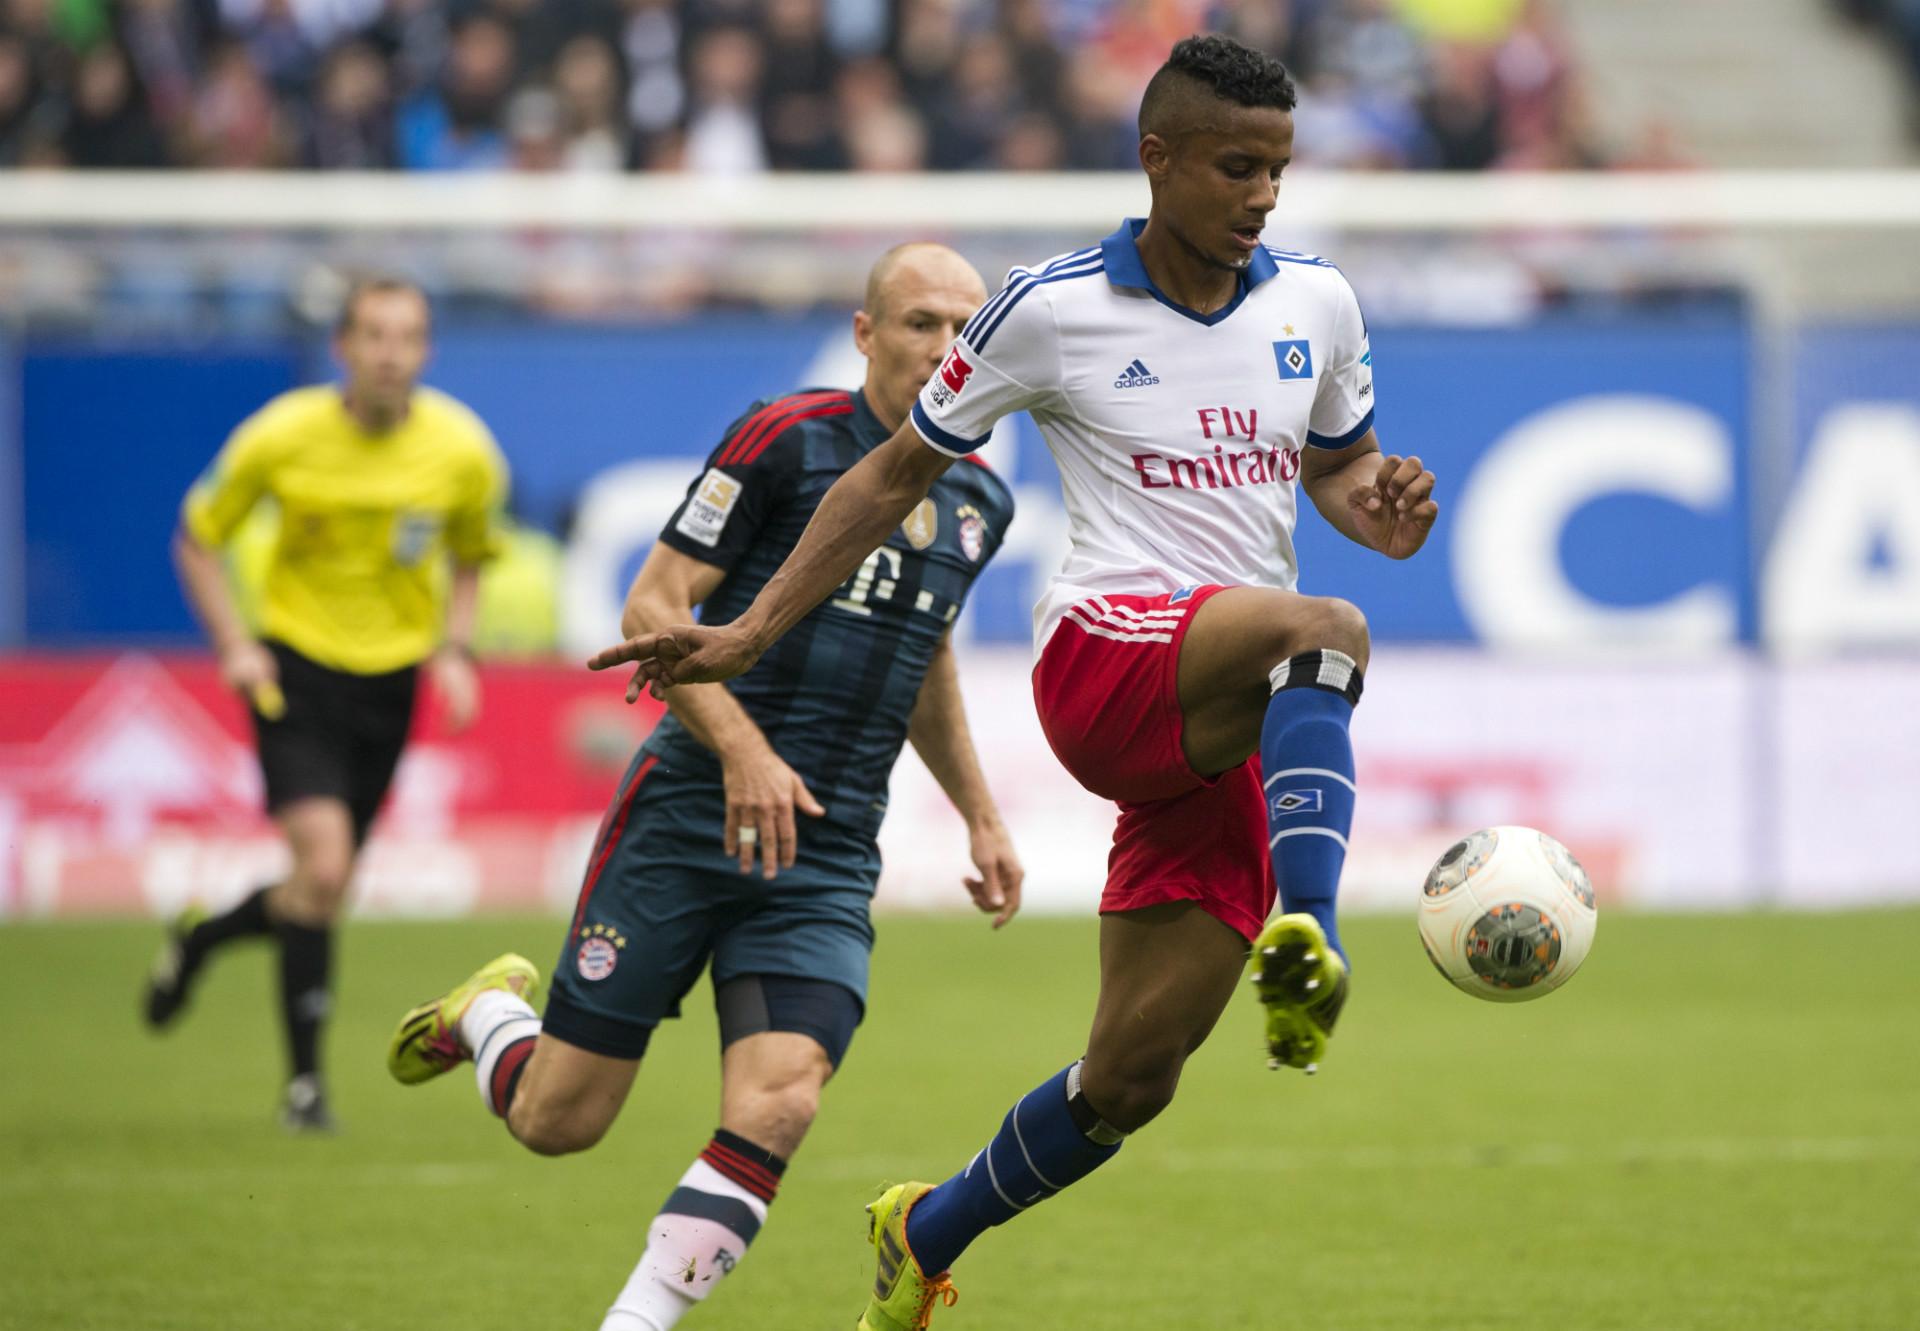 Borussia Dortmund boss Lucien Favre hints at Sancho exit